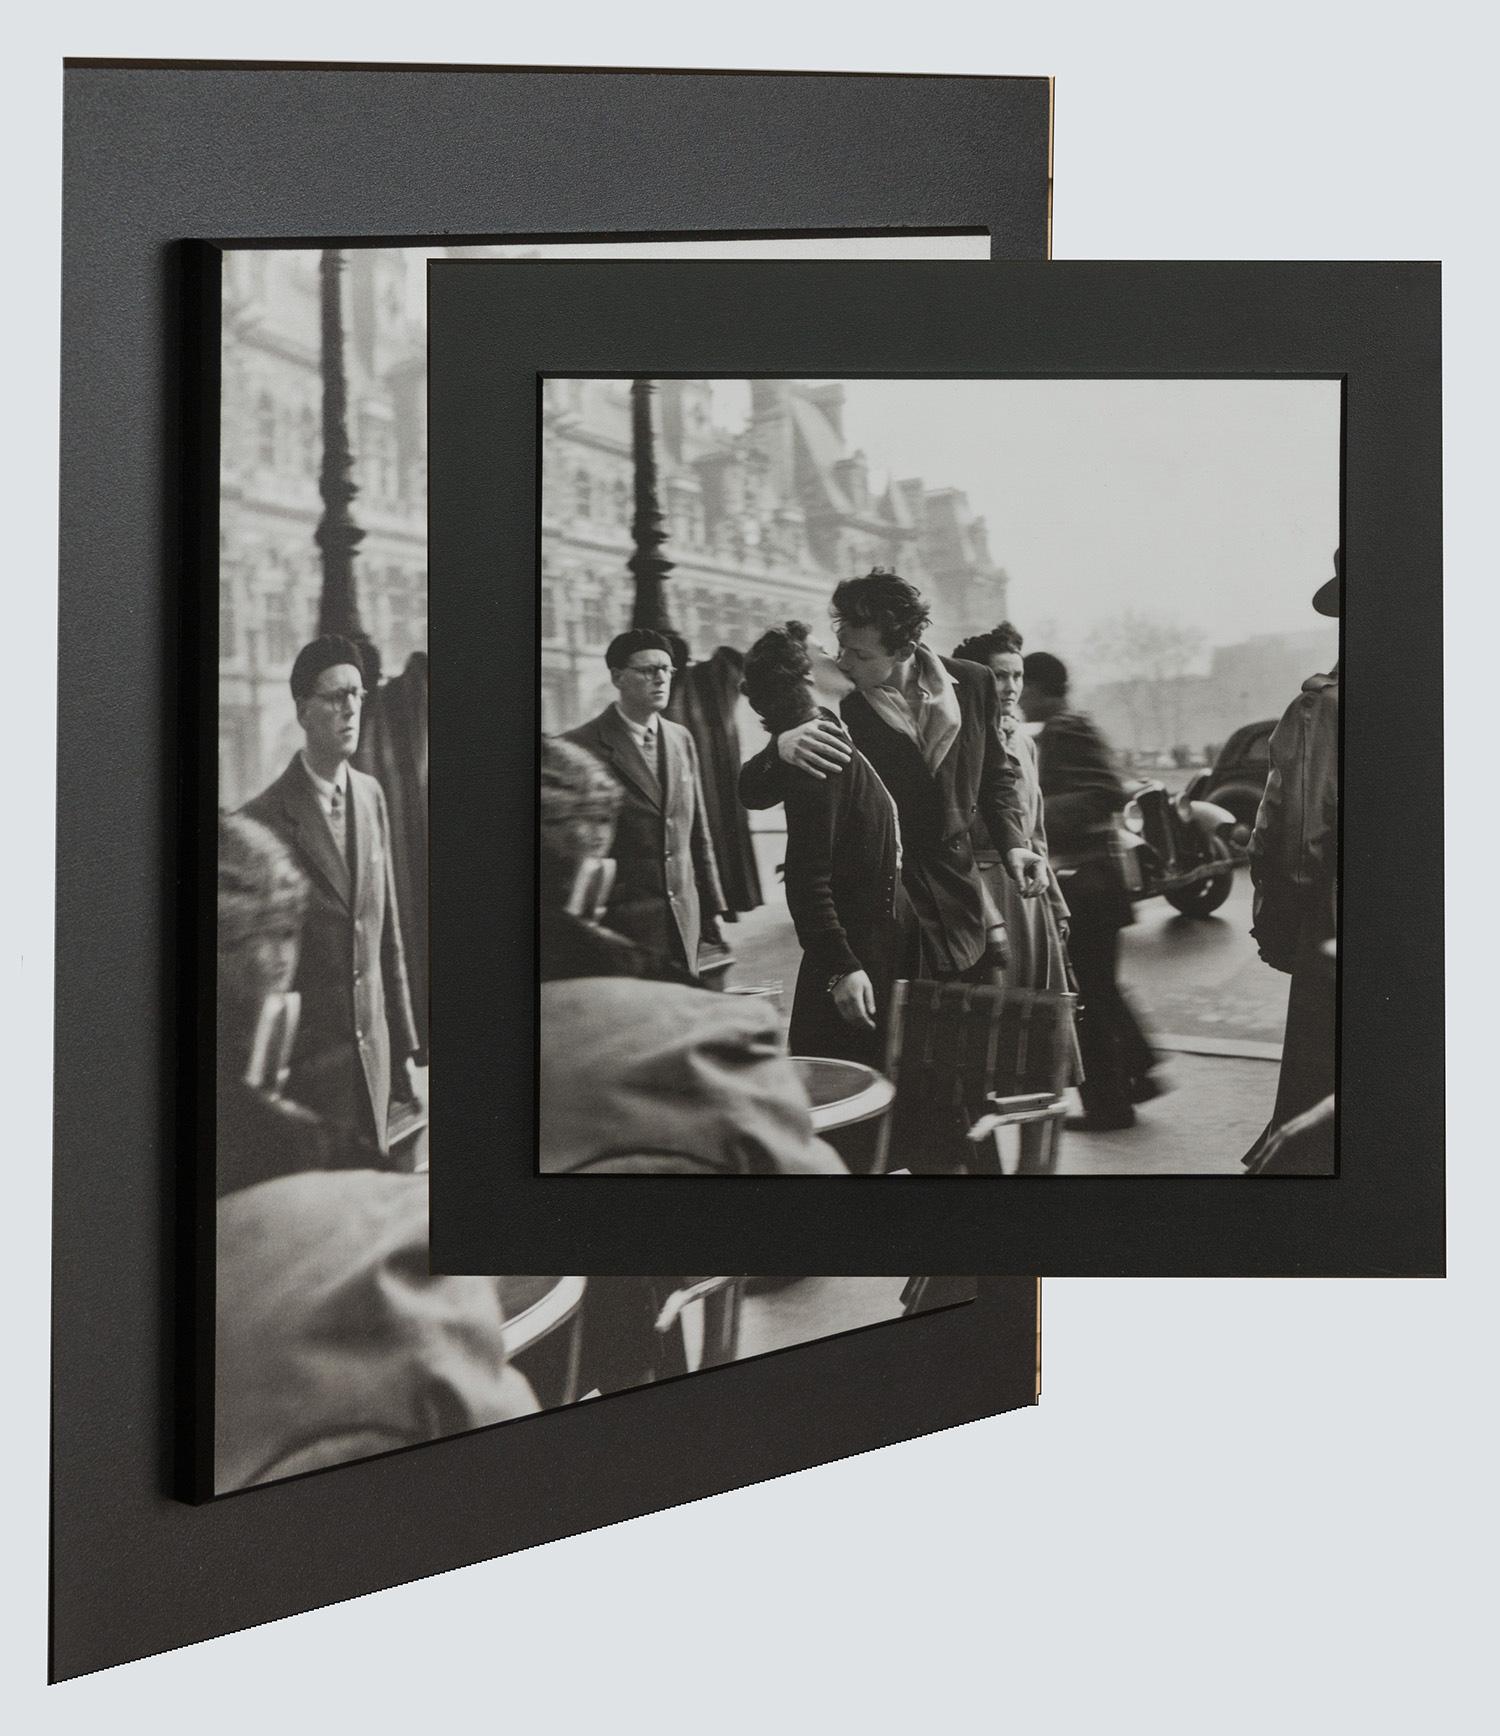 stack mount style of plaque mount framing-1940]era New York street scene